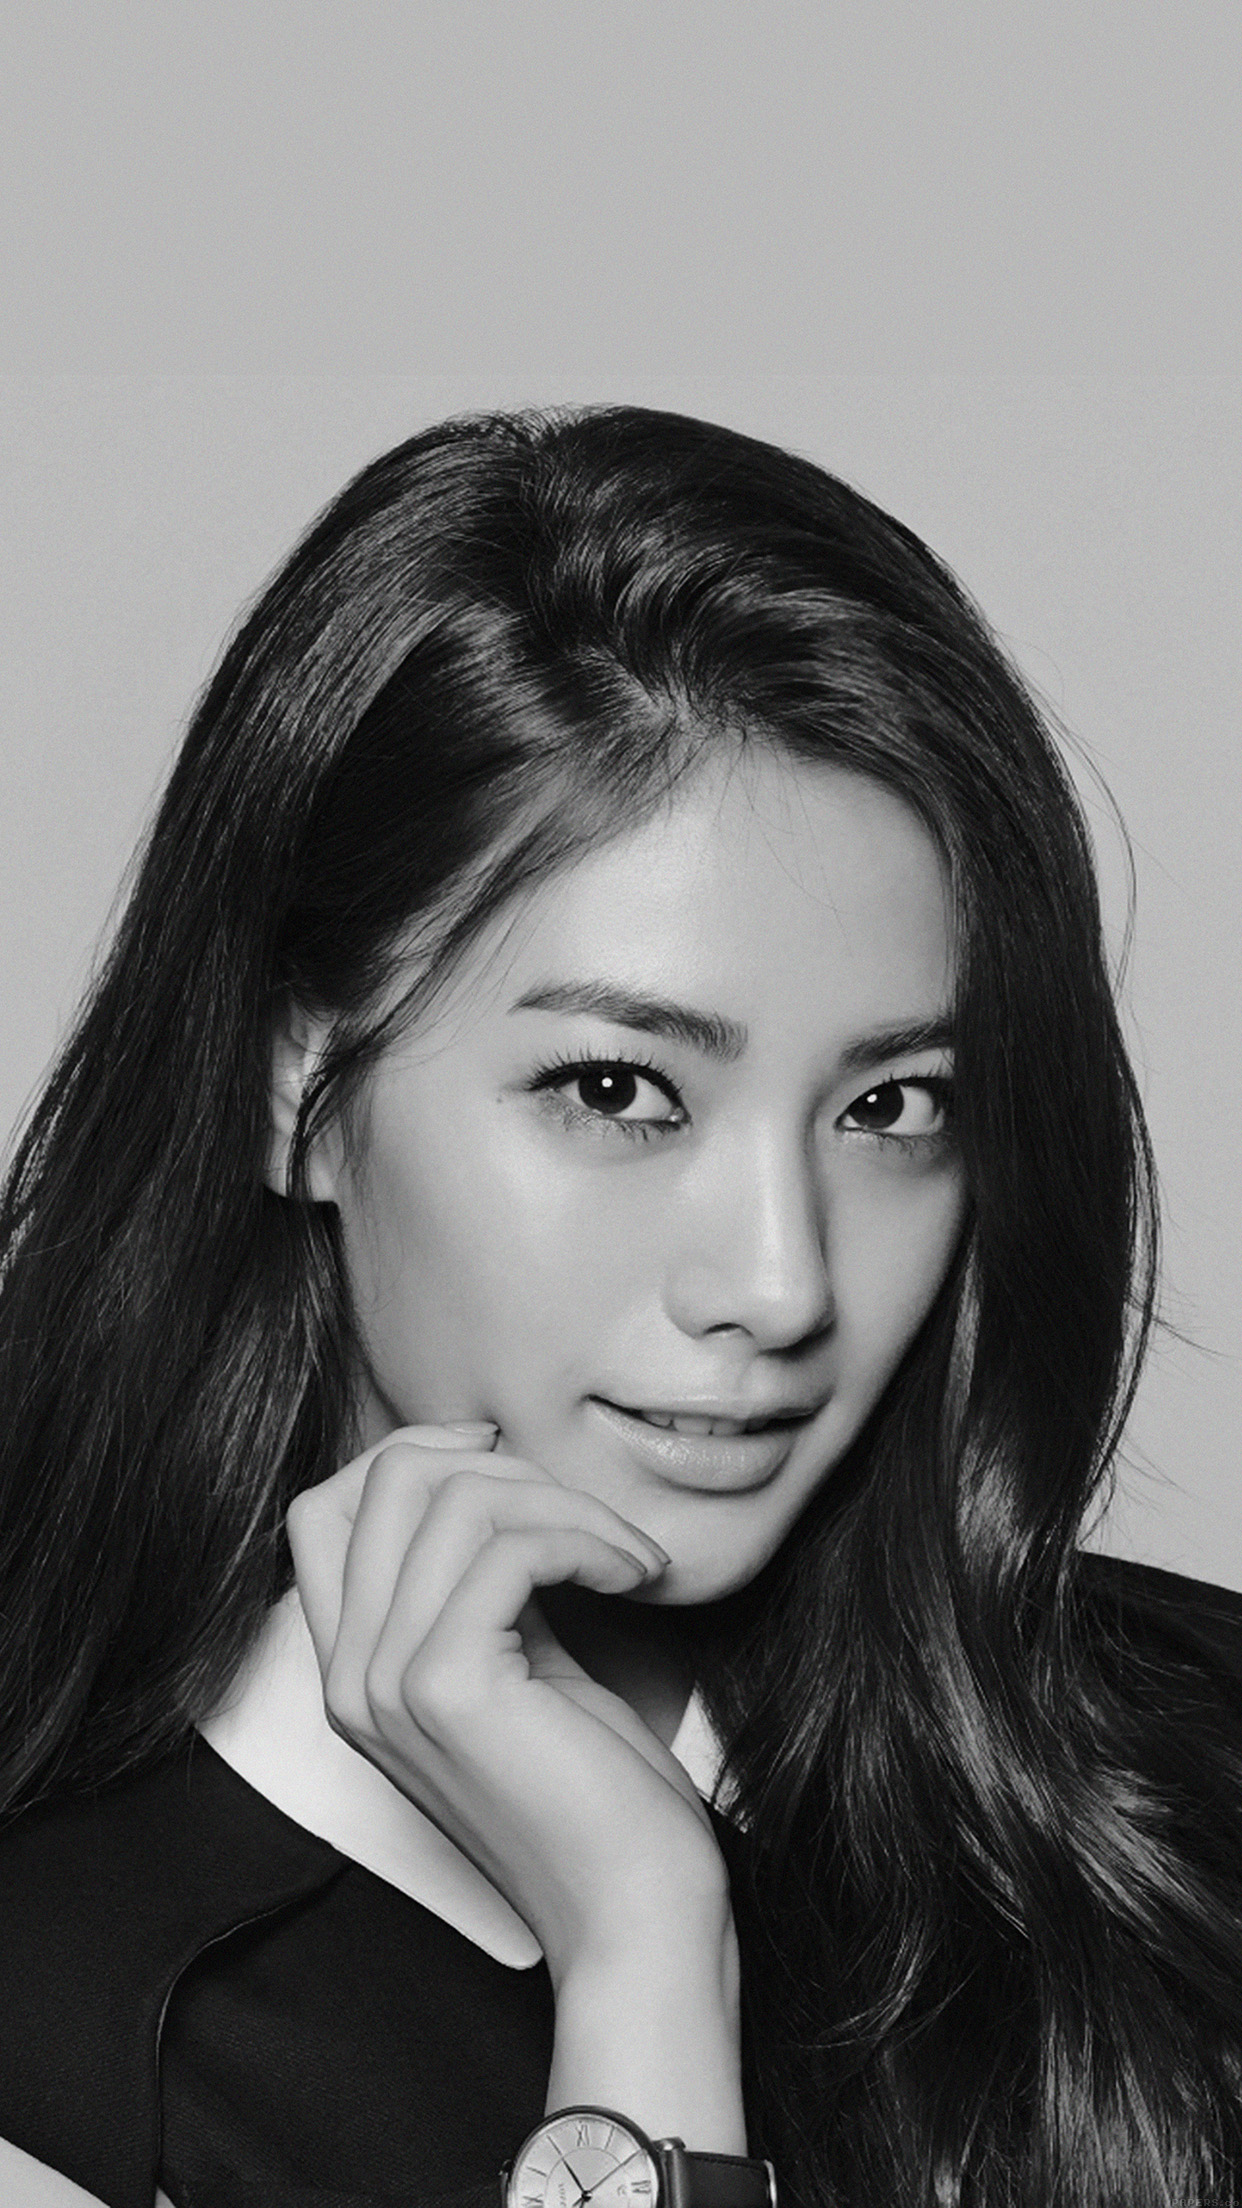 Nana Kpop Idol Dark Bw Music Sexy Girl Android Wallpaper